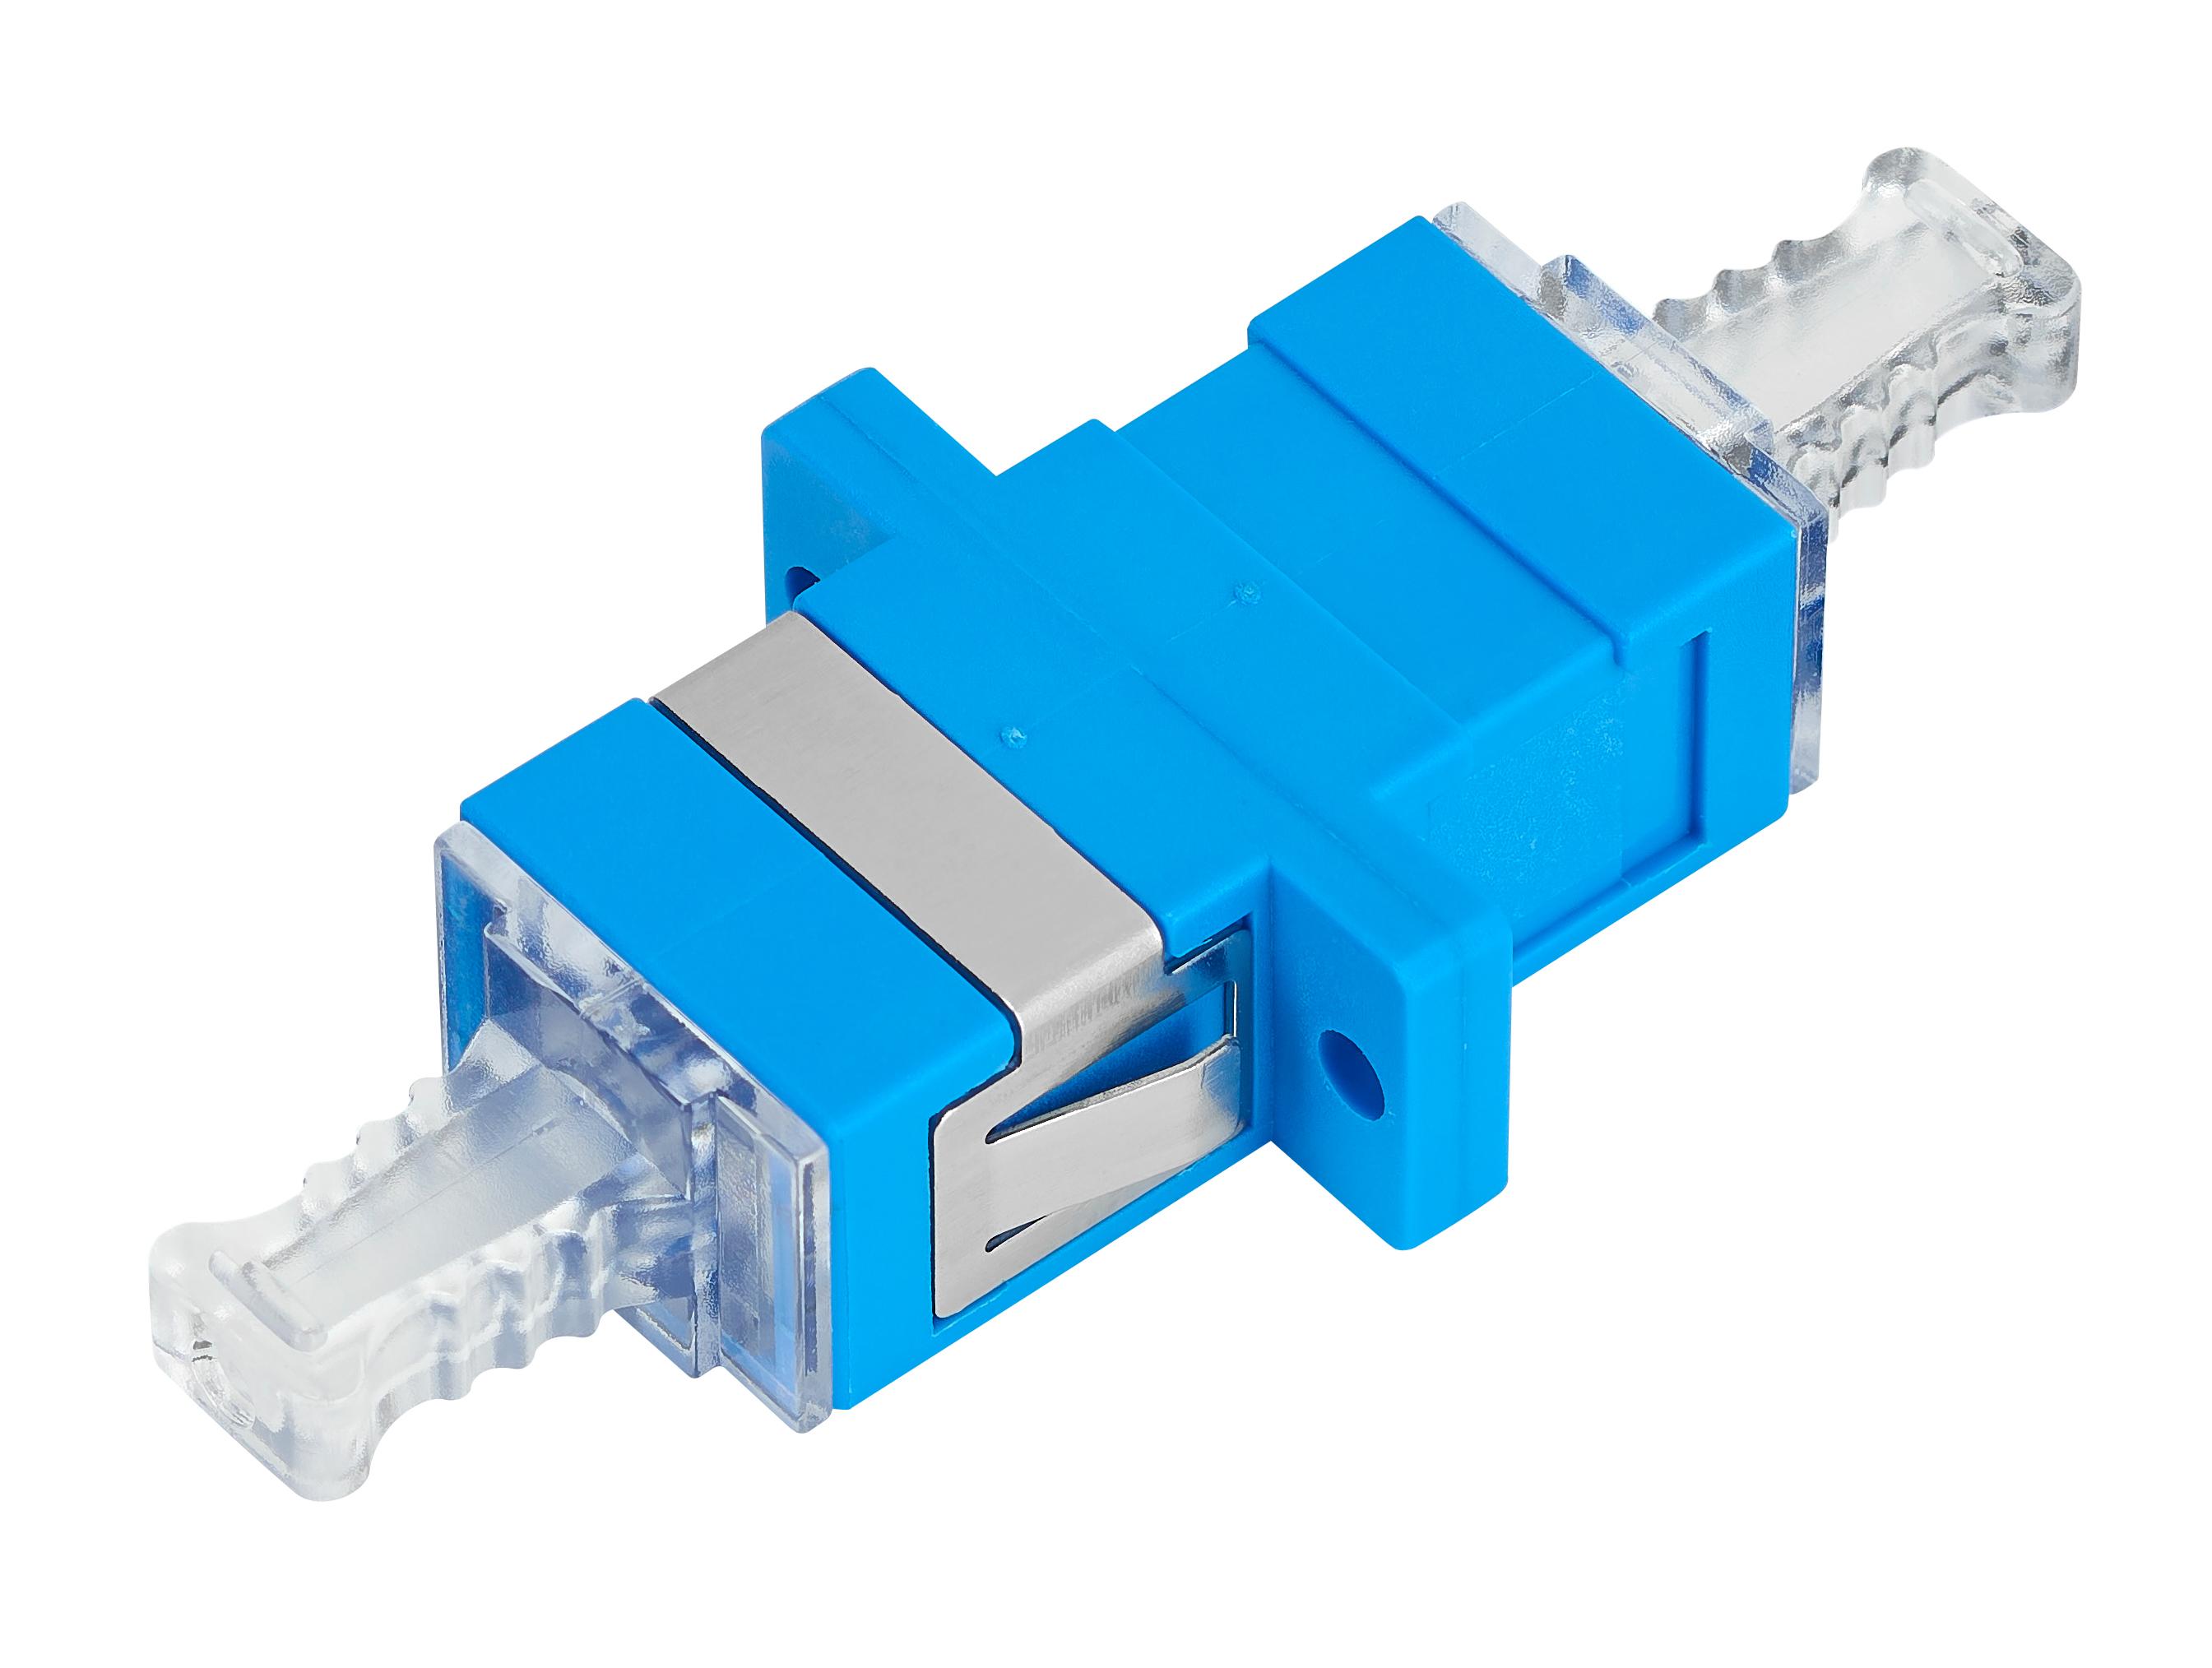 1 Stk LWL Kupplung SC-Simplex,Kunststoff,Singlemode,zirc, Fl, blau HMOL000055